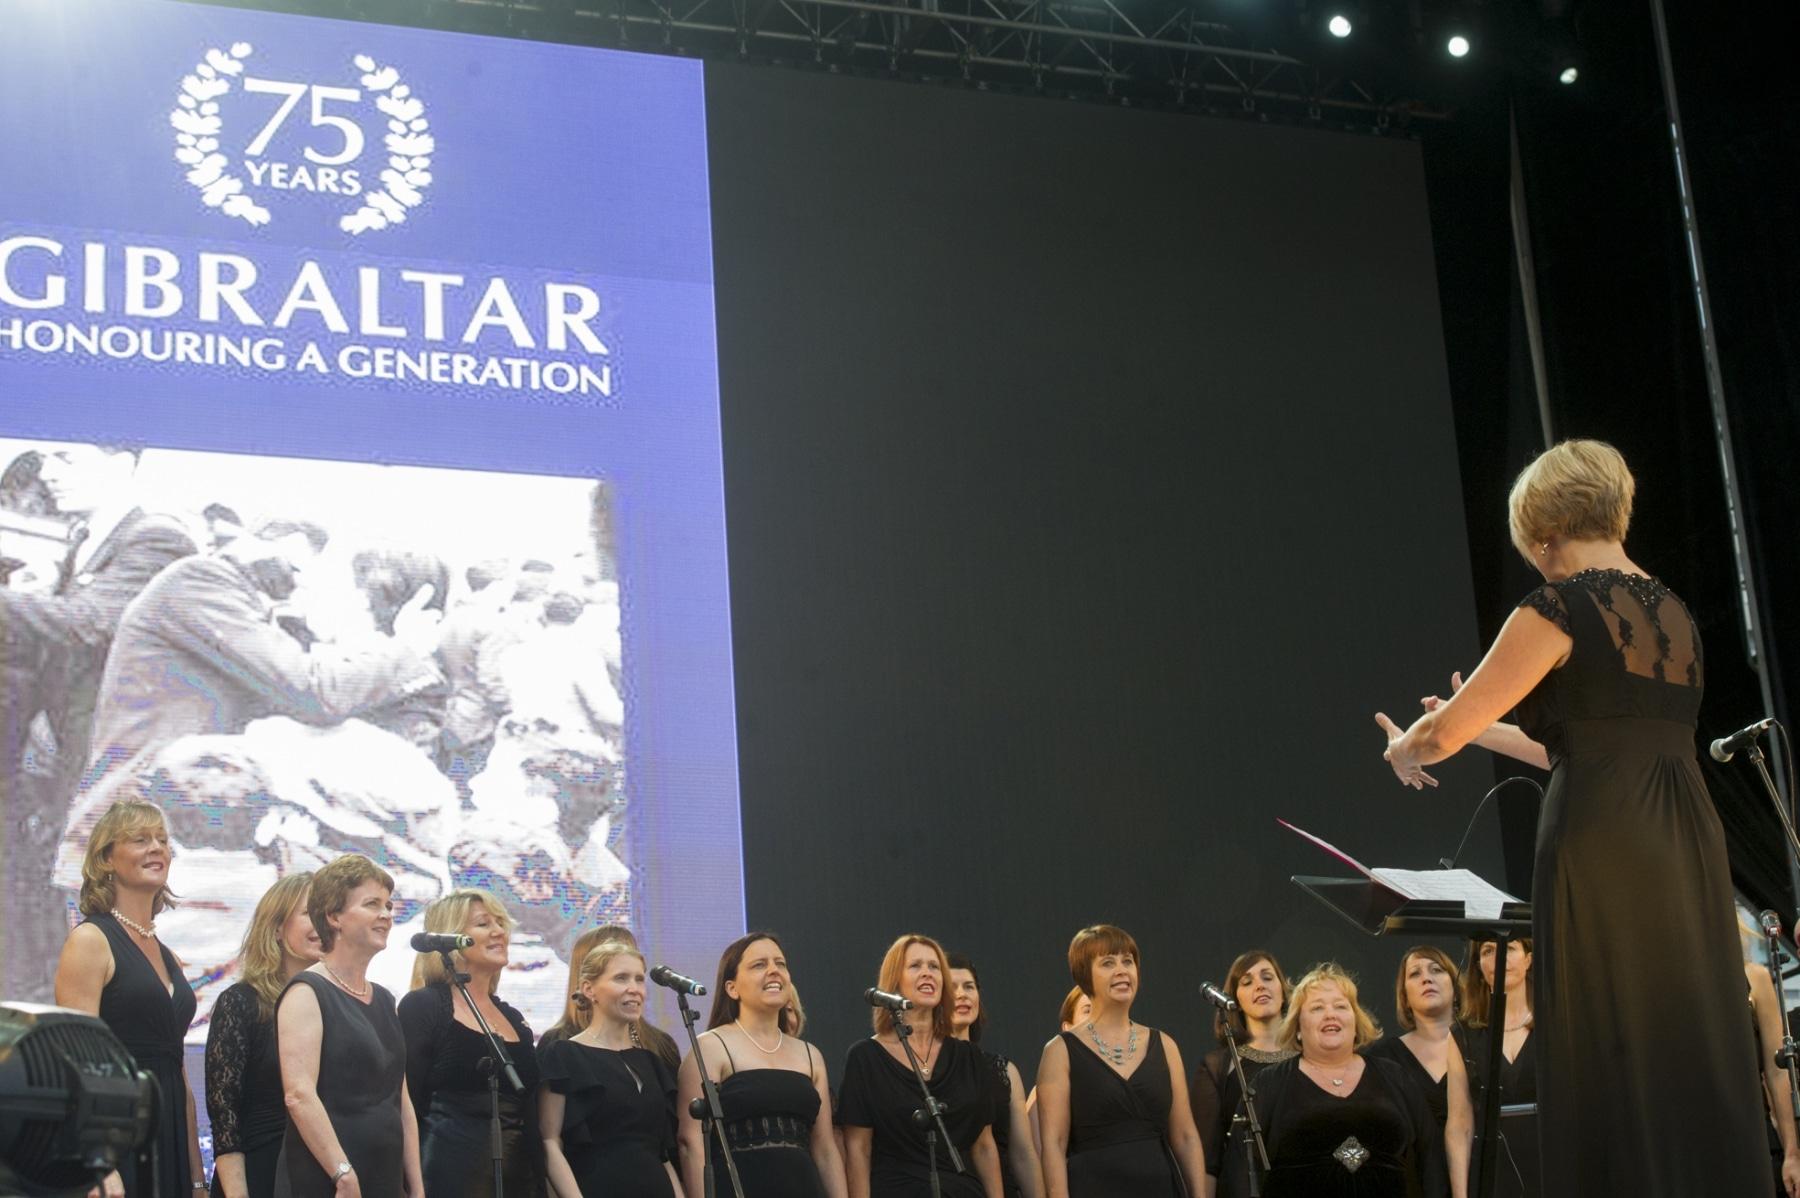 concierto-evacuados-de-gibraltar-07092015-47bn_21051017518_o